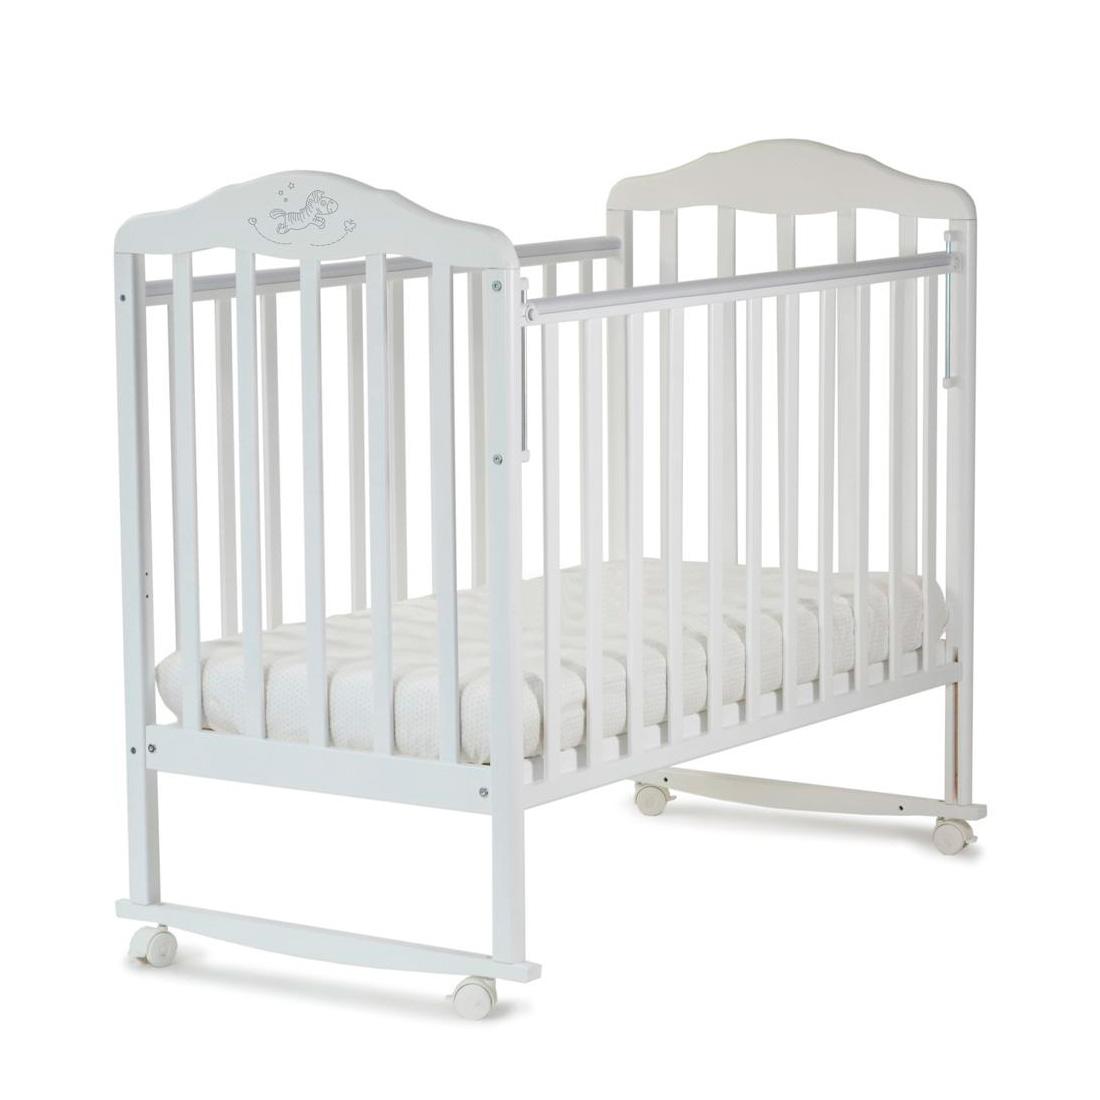 Кроватка Малика Зебра качалка Белый<br>